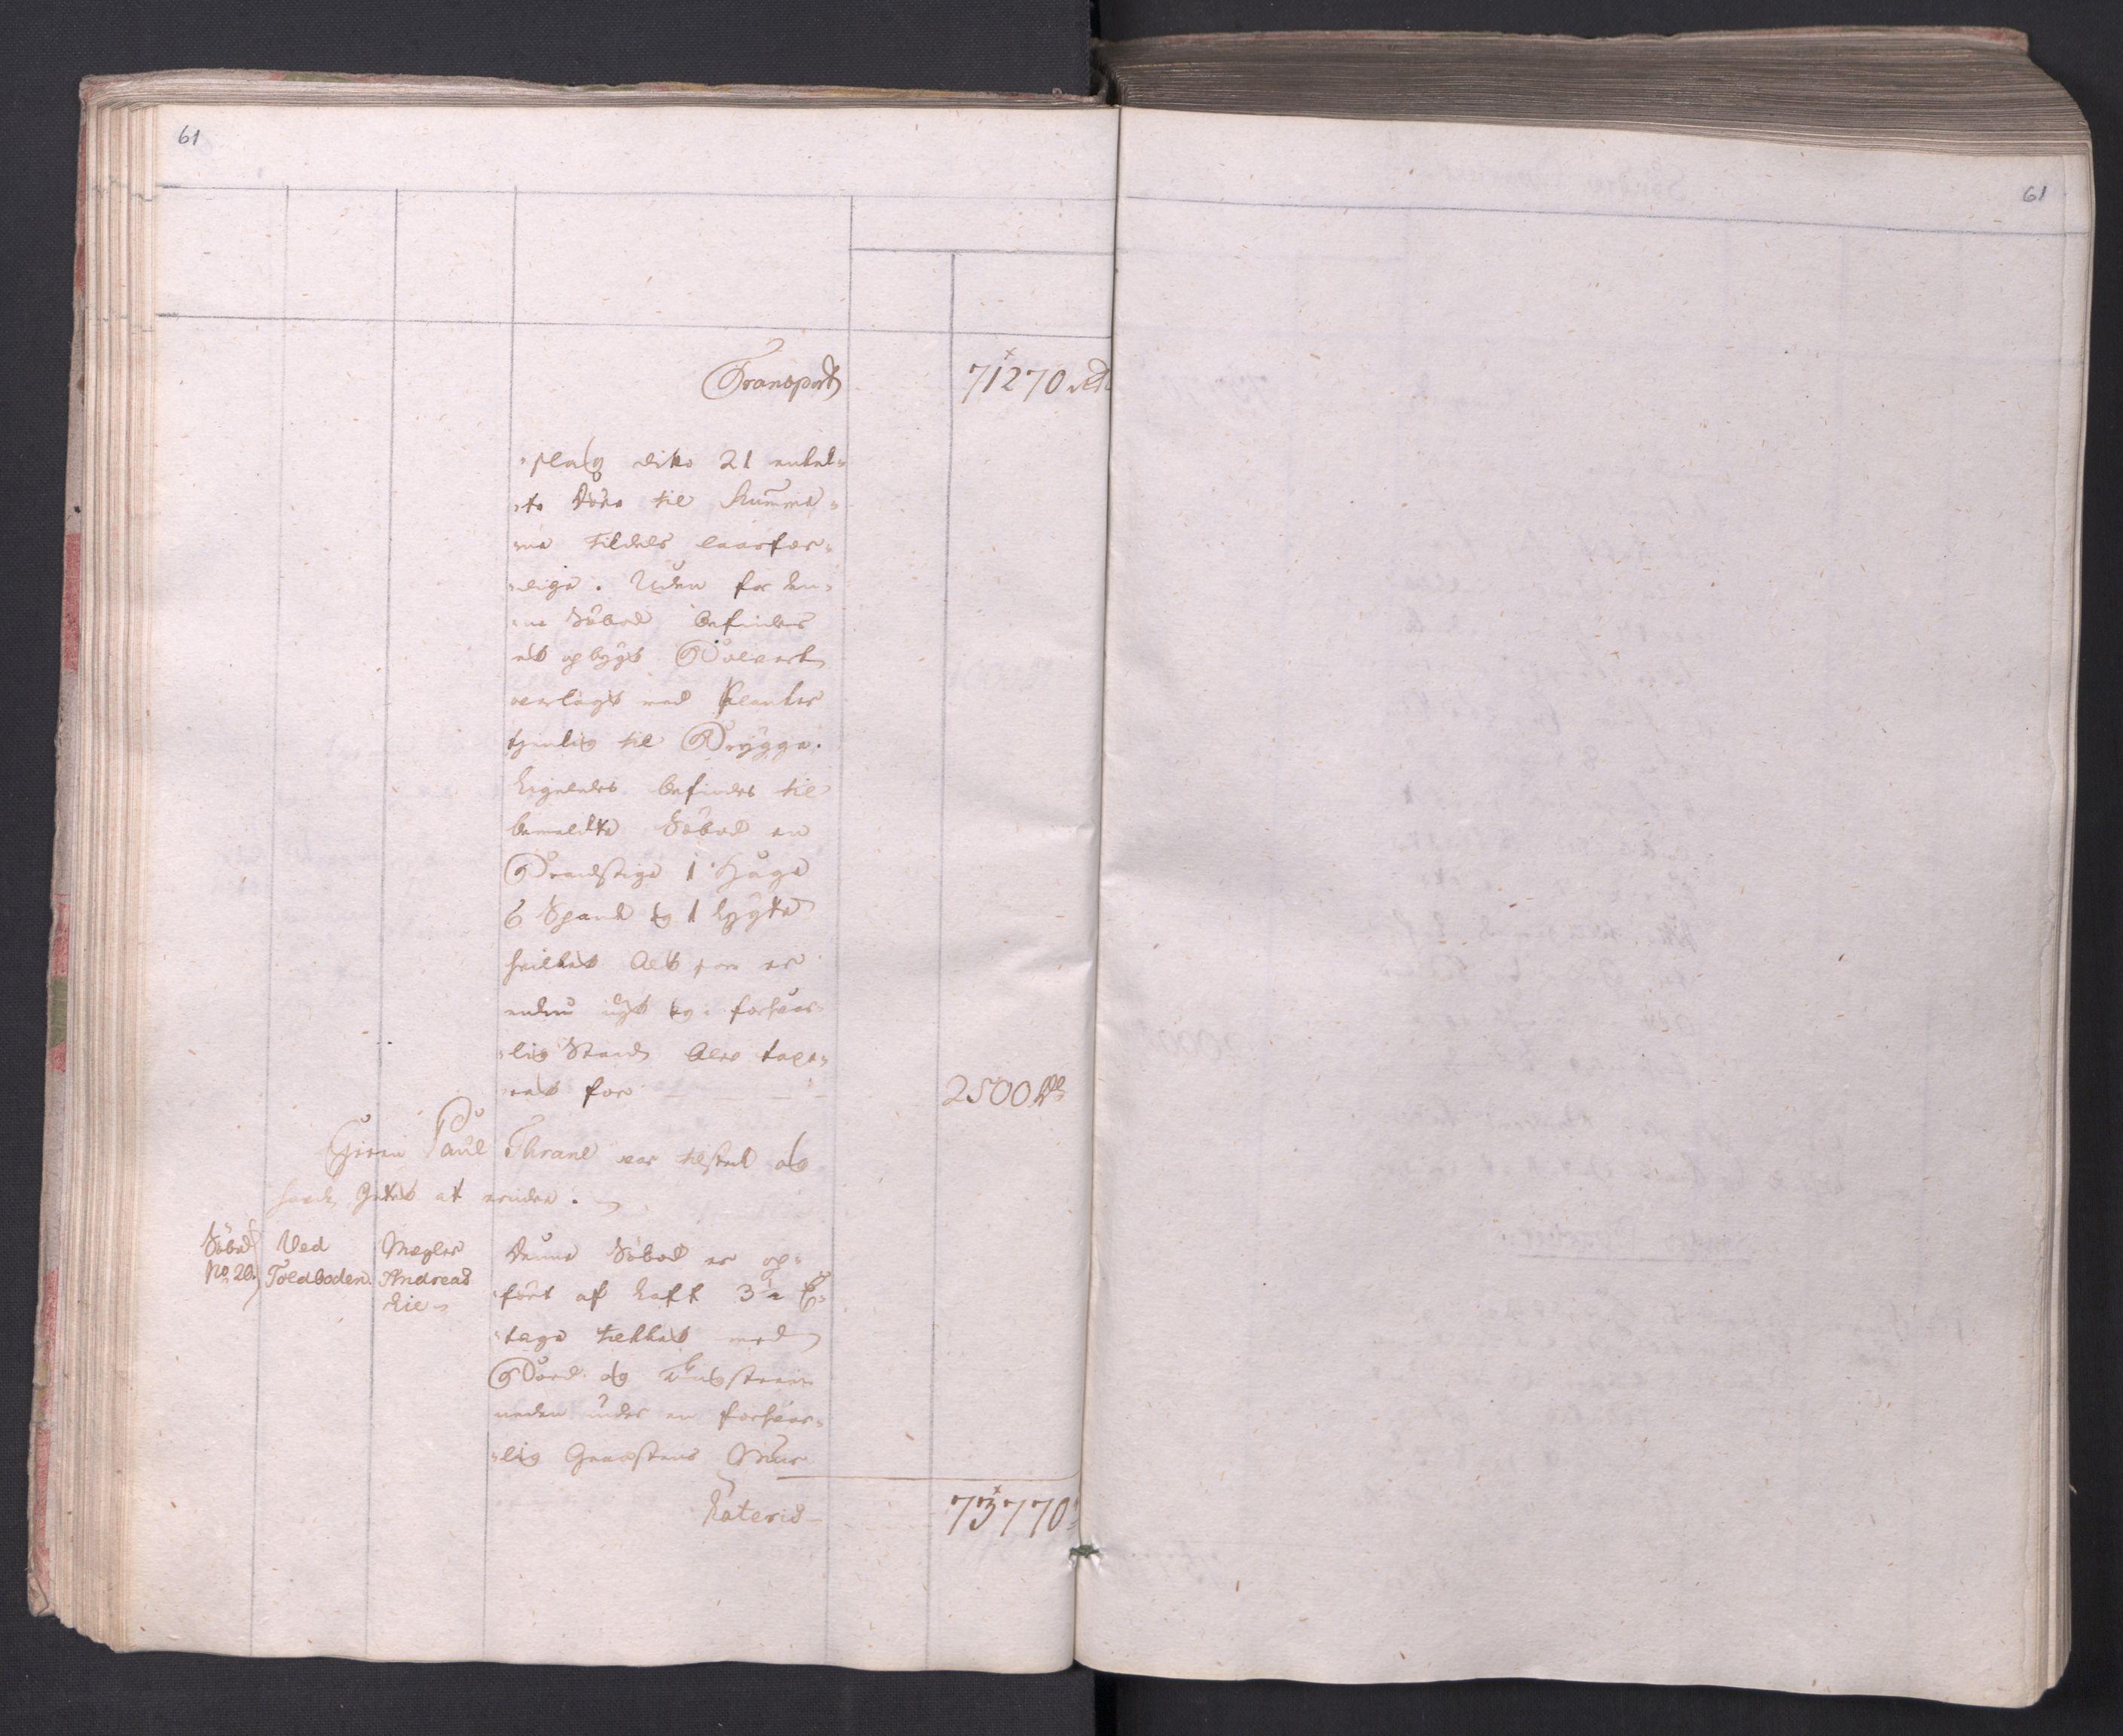 SAO, Kristiania stiftamt, I/Ia/L0015: Branntakster, 1797, s. 61